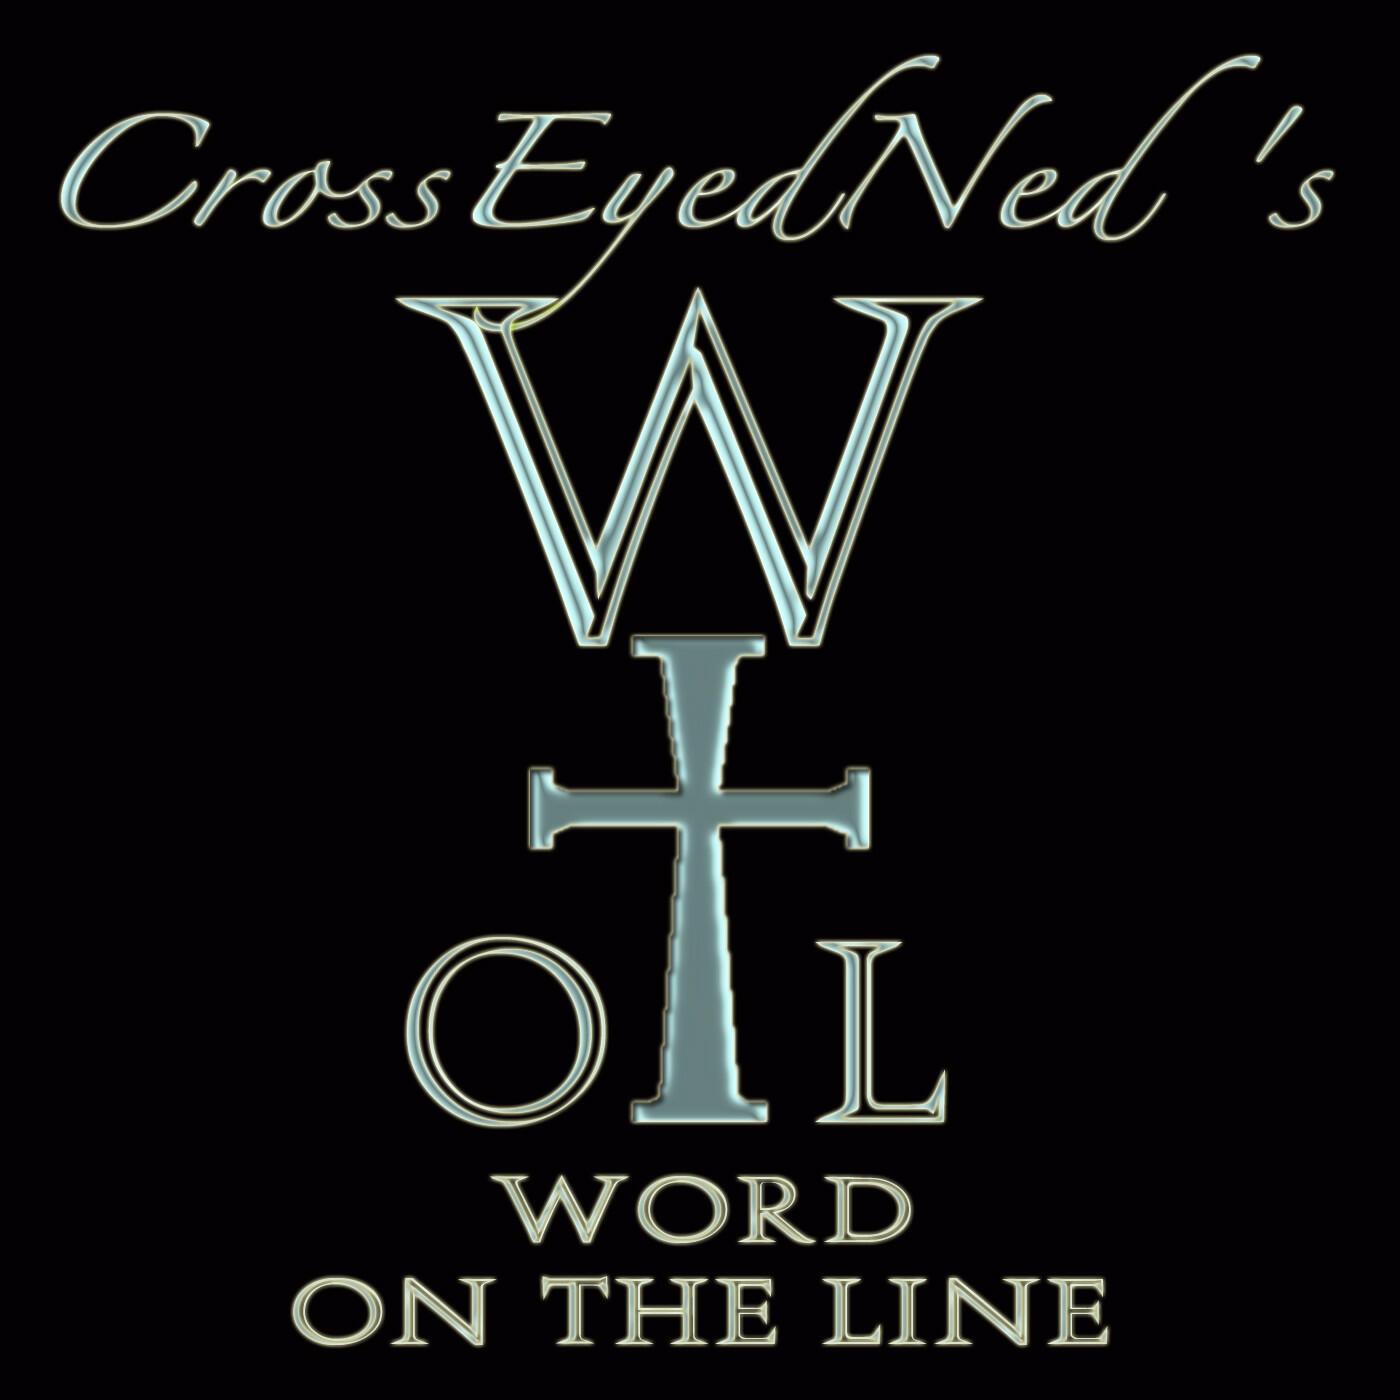 CrossEyedNed's Word On The Line